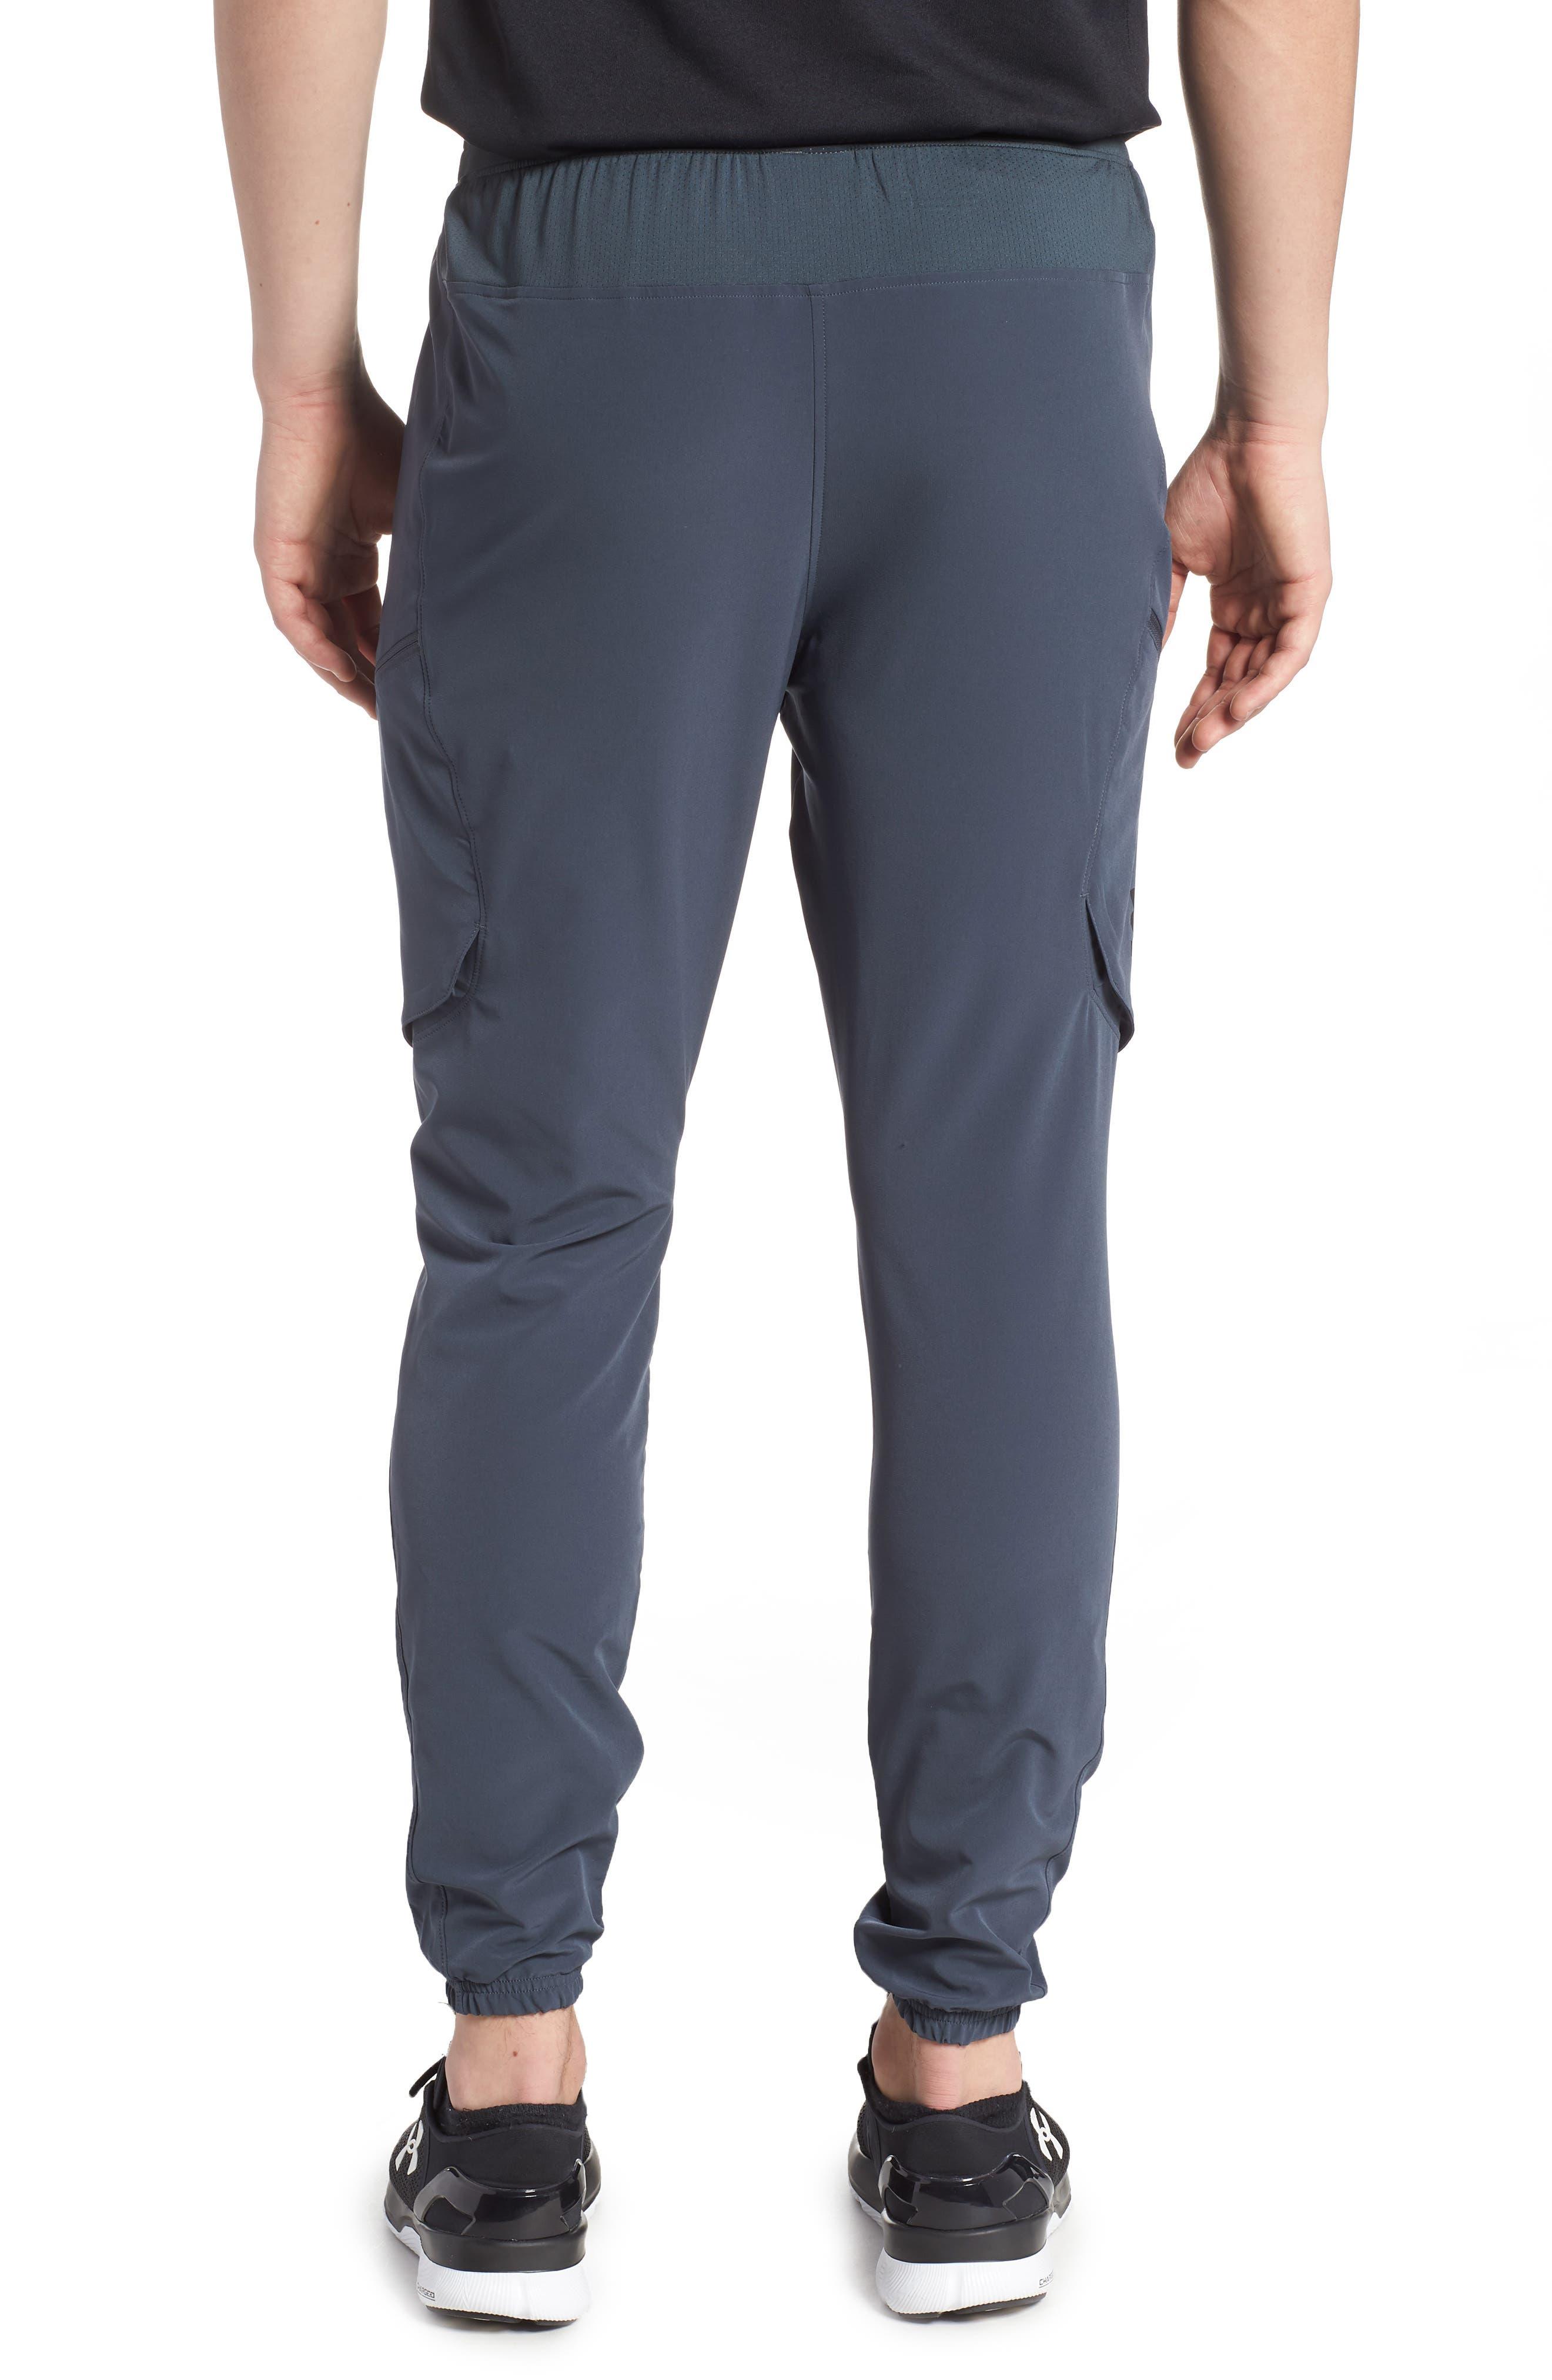 Perpetual Cargo Jogger Pants,                             Alternate thumbnail 2, color,                             STEALTH GRAY/ BLACK